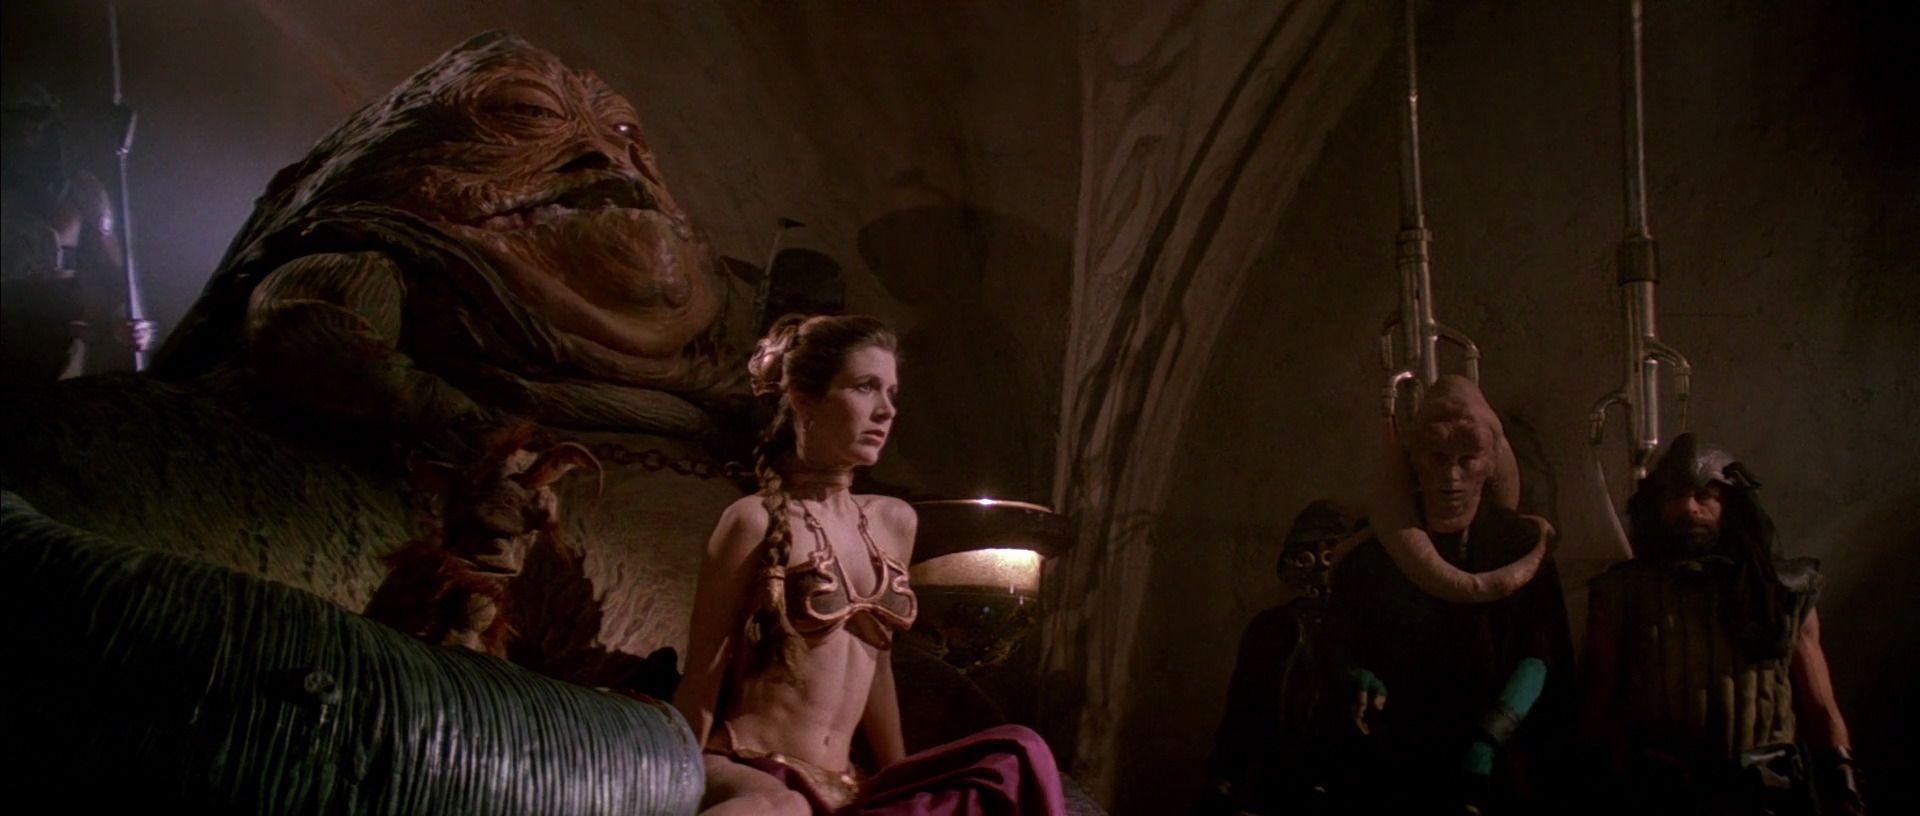 Jabba The Hutt Fucks Princess Leia Delightful princess leia   princess leia   pinterest   princess leia